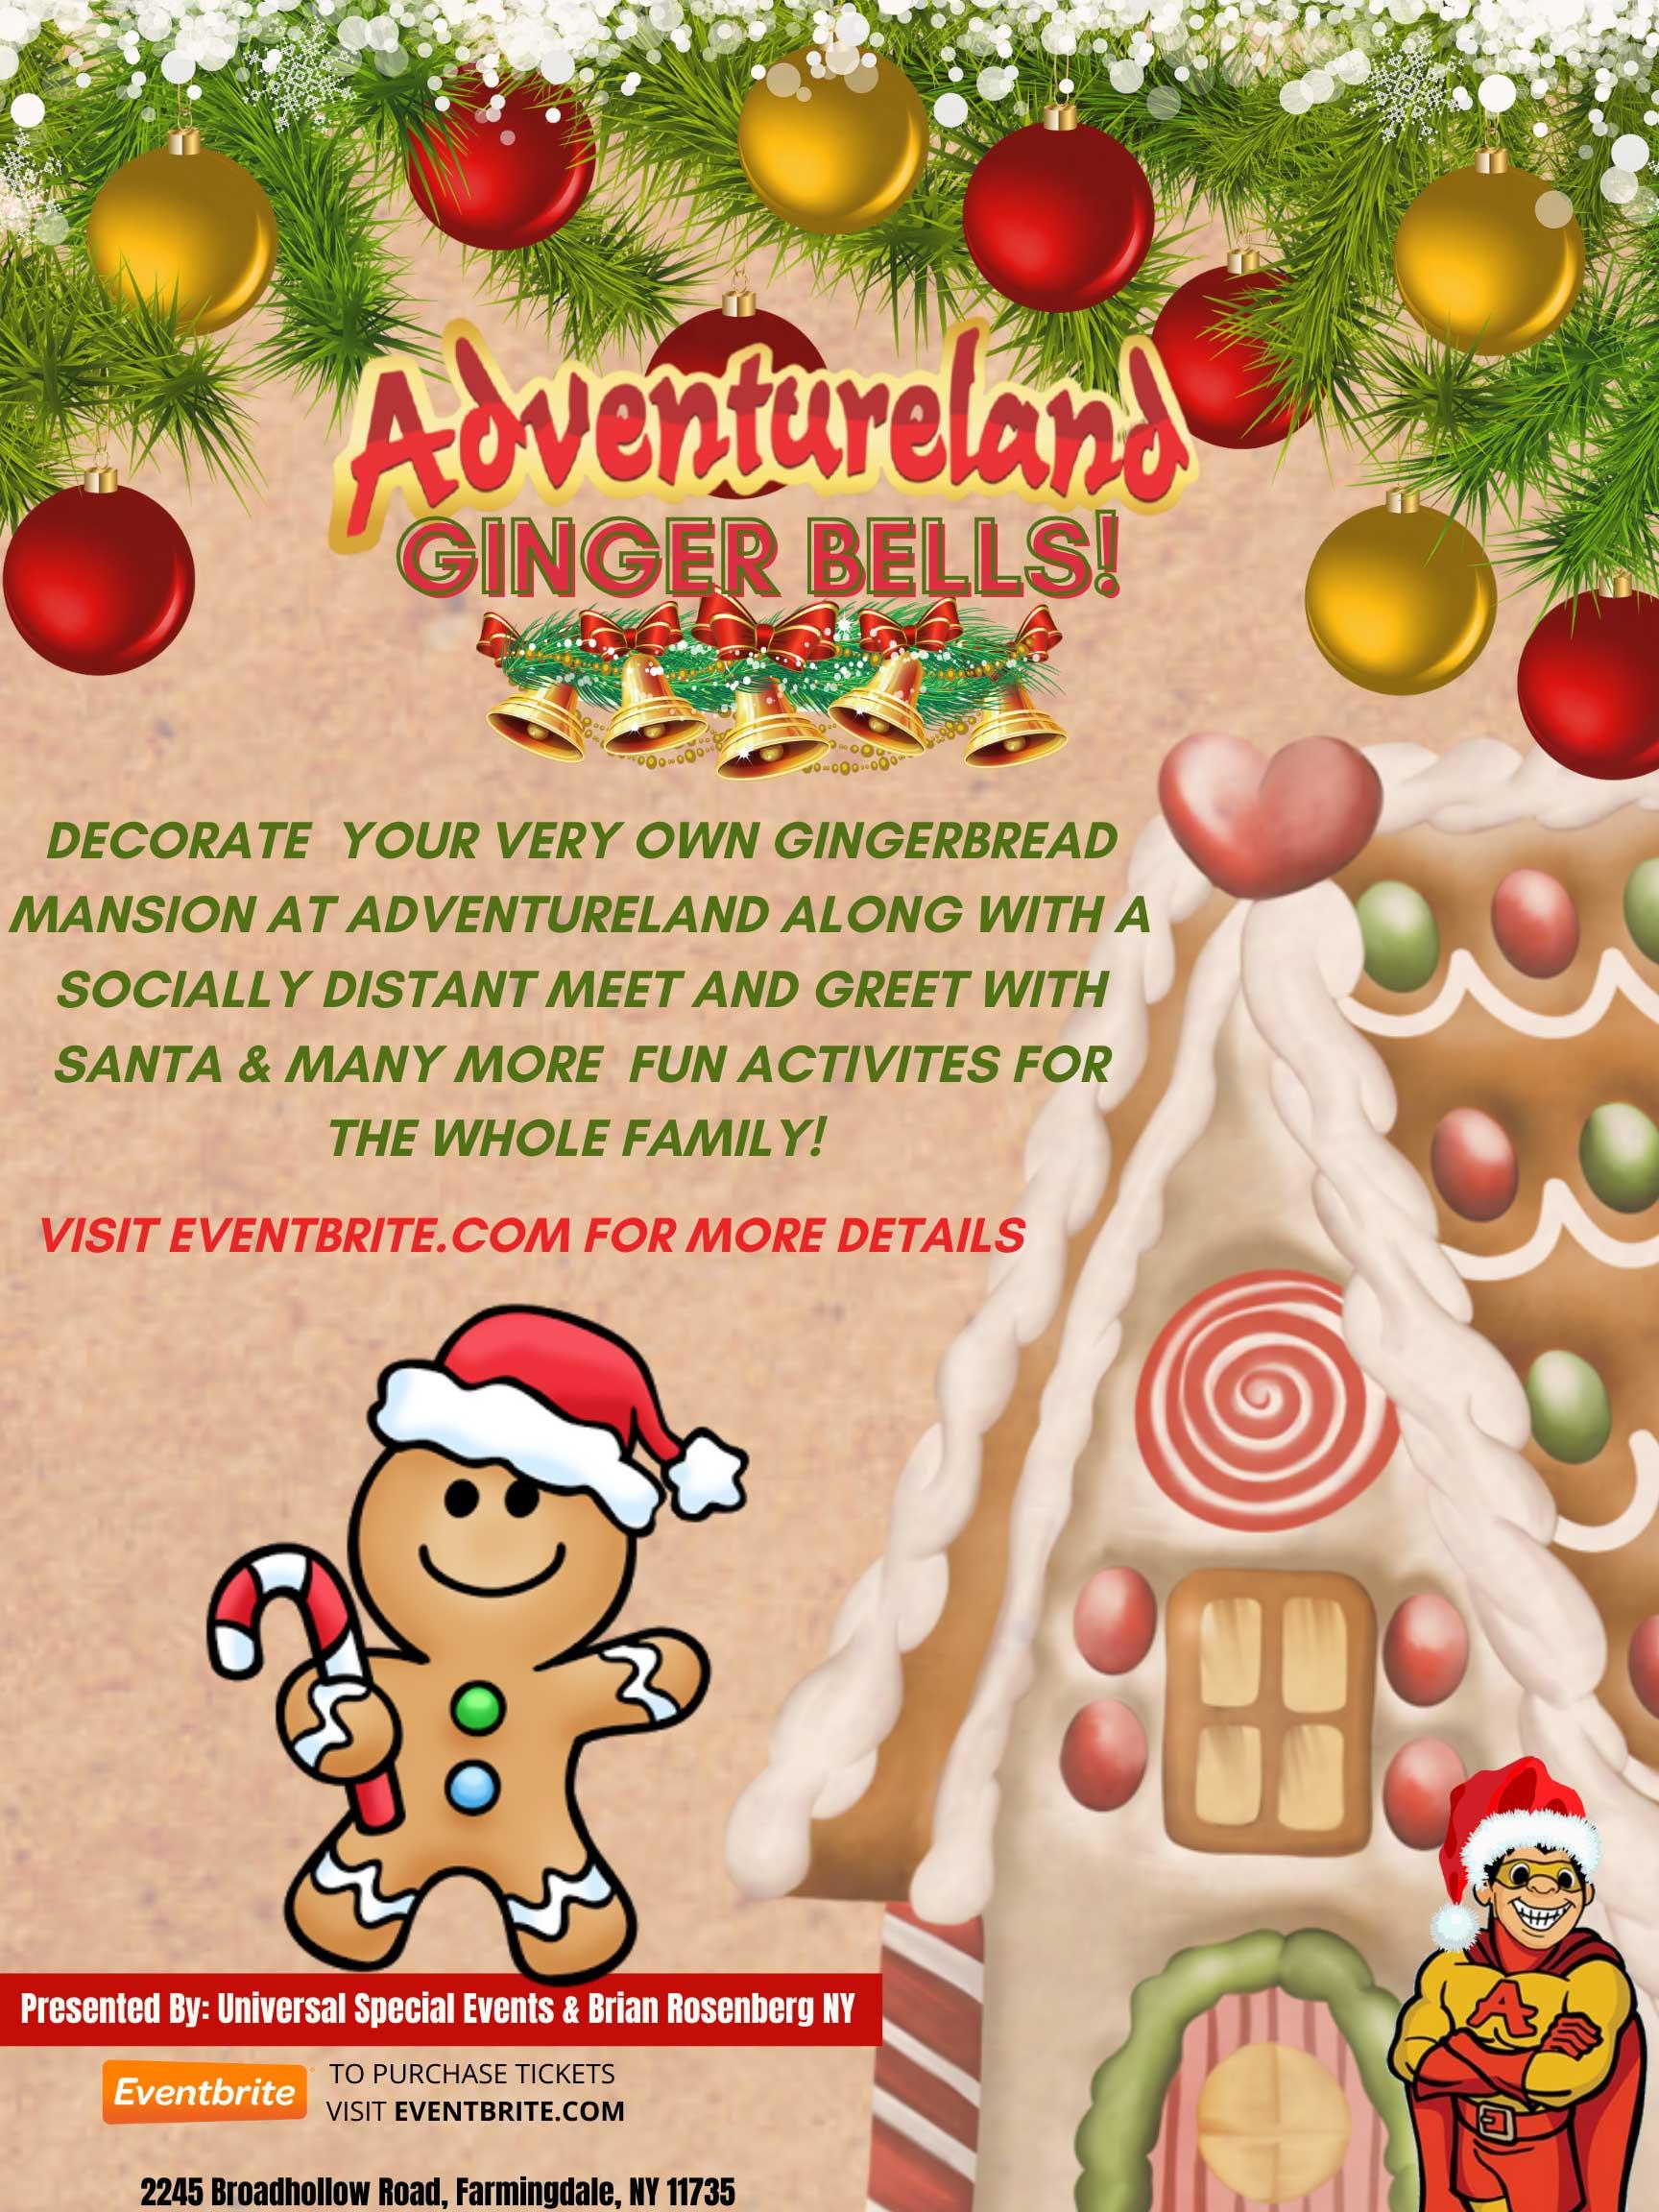 Adventureland Ginger Bells